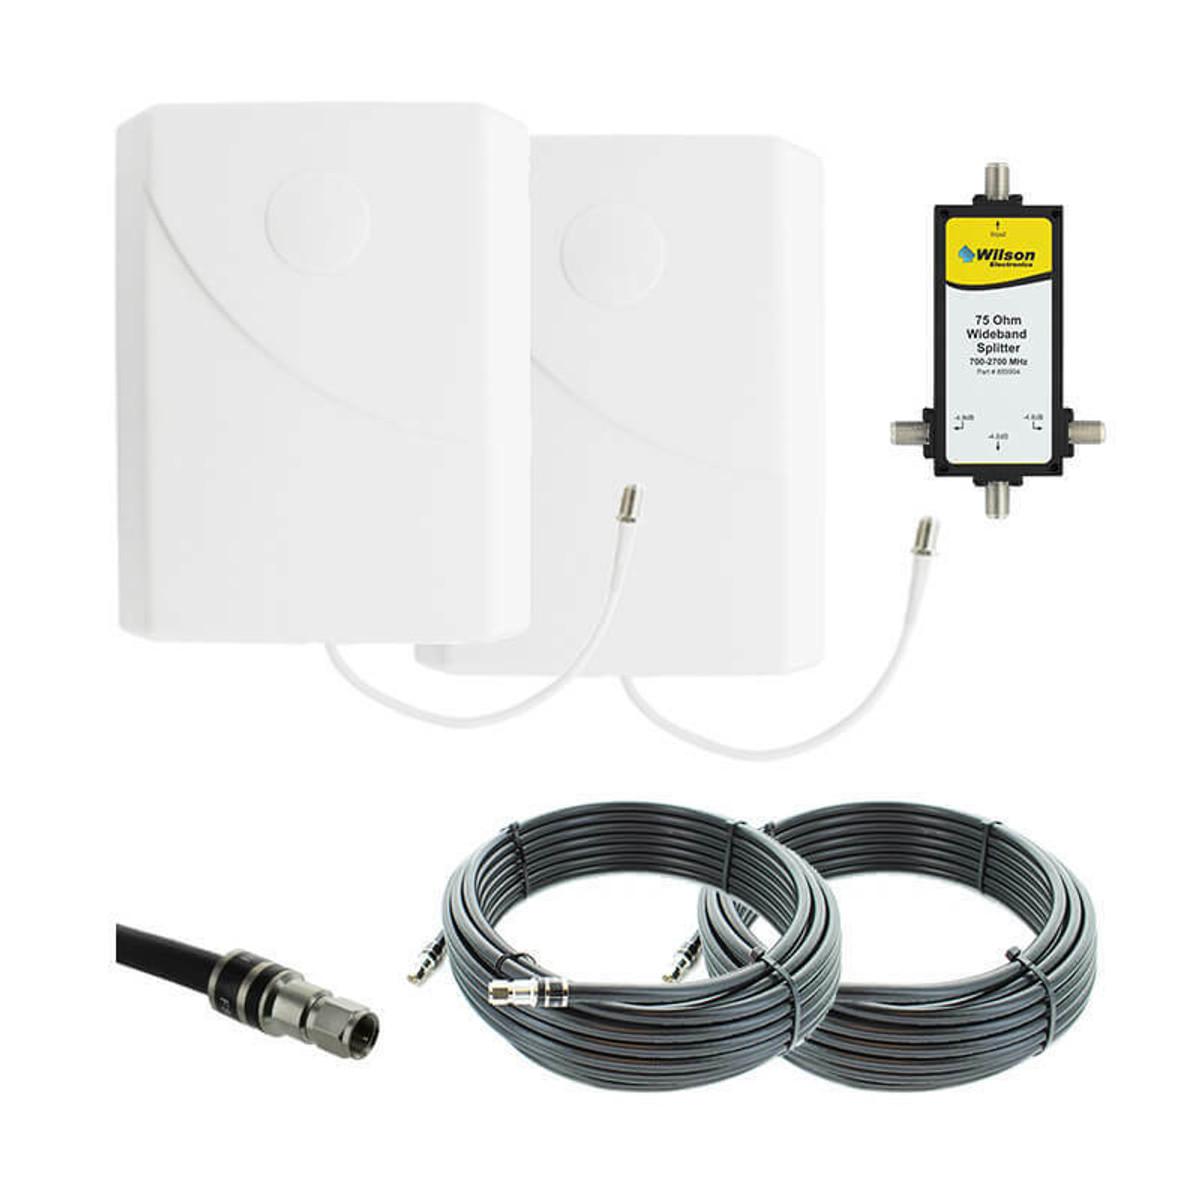 Wilson Dual Antenna Expansion Kit 75 Ohm - 309910-75F